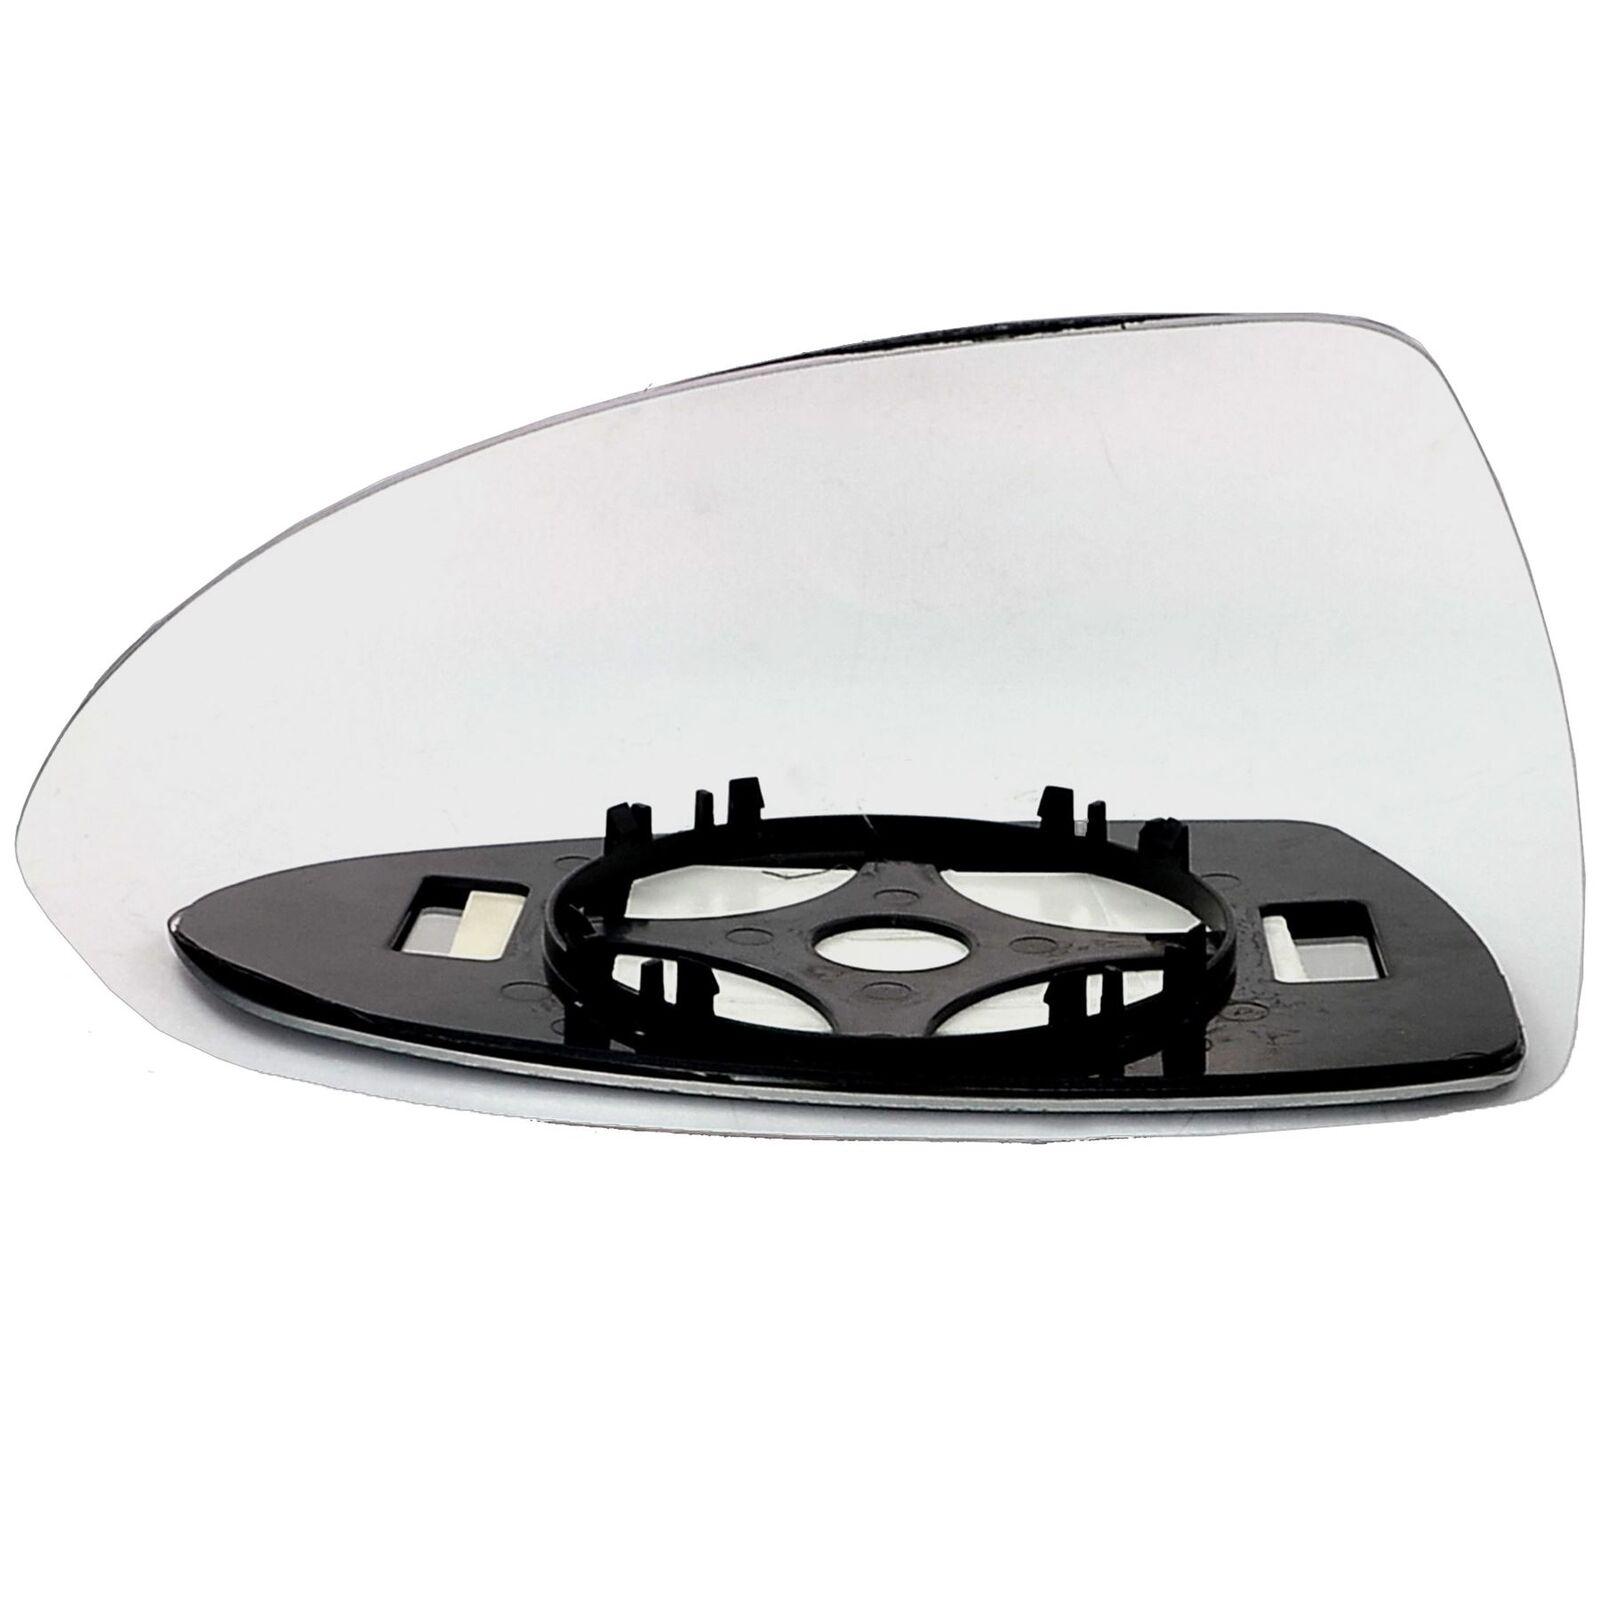 NEW Wing Mirror Glass VAUXHALL CORSA Passenger 06-/>